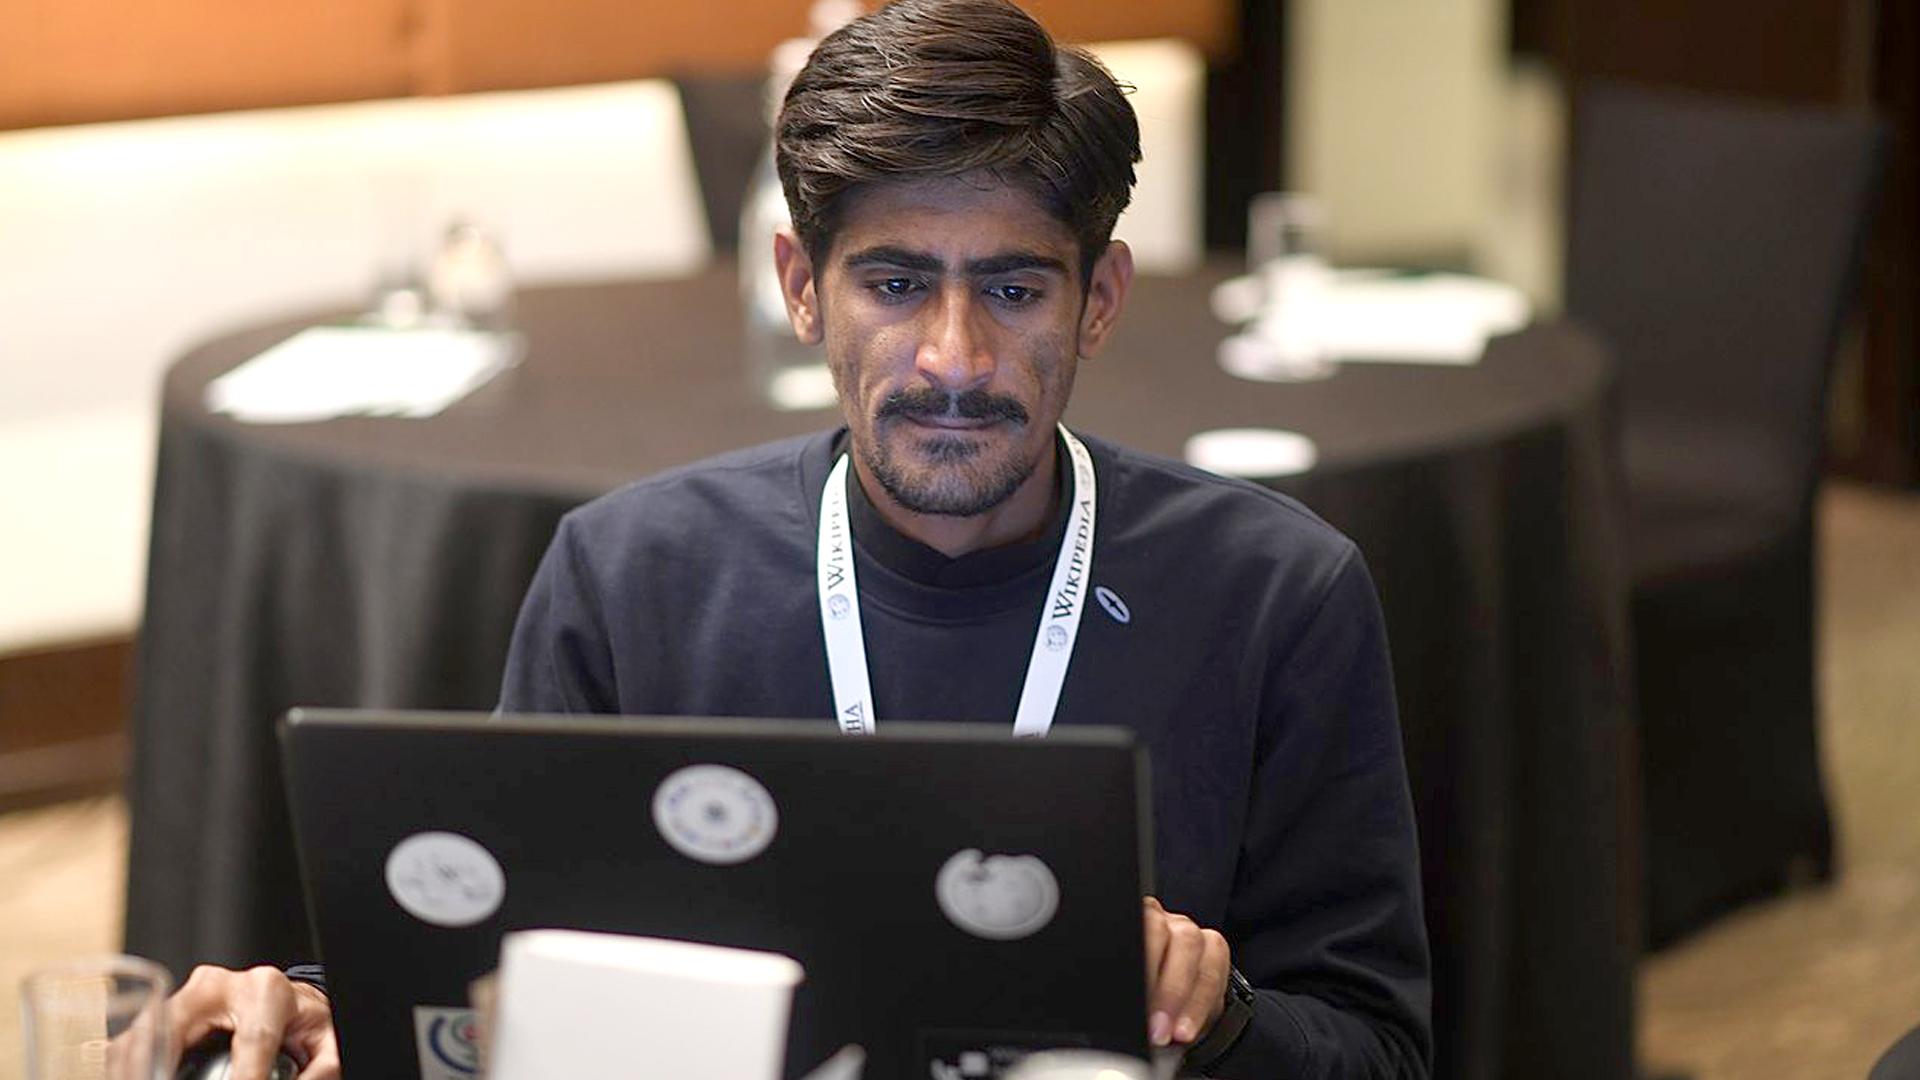 Cricki-pedia: Young Carpenter's Love Of Cricket Makes Him A Wiki Star